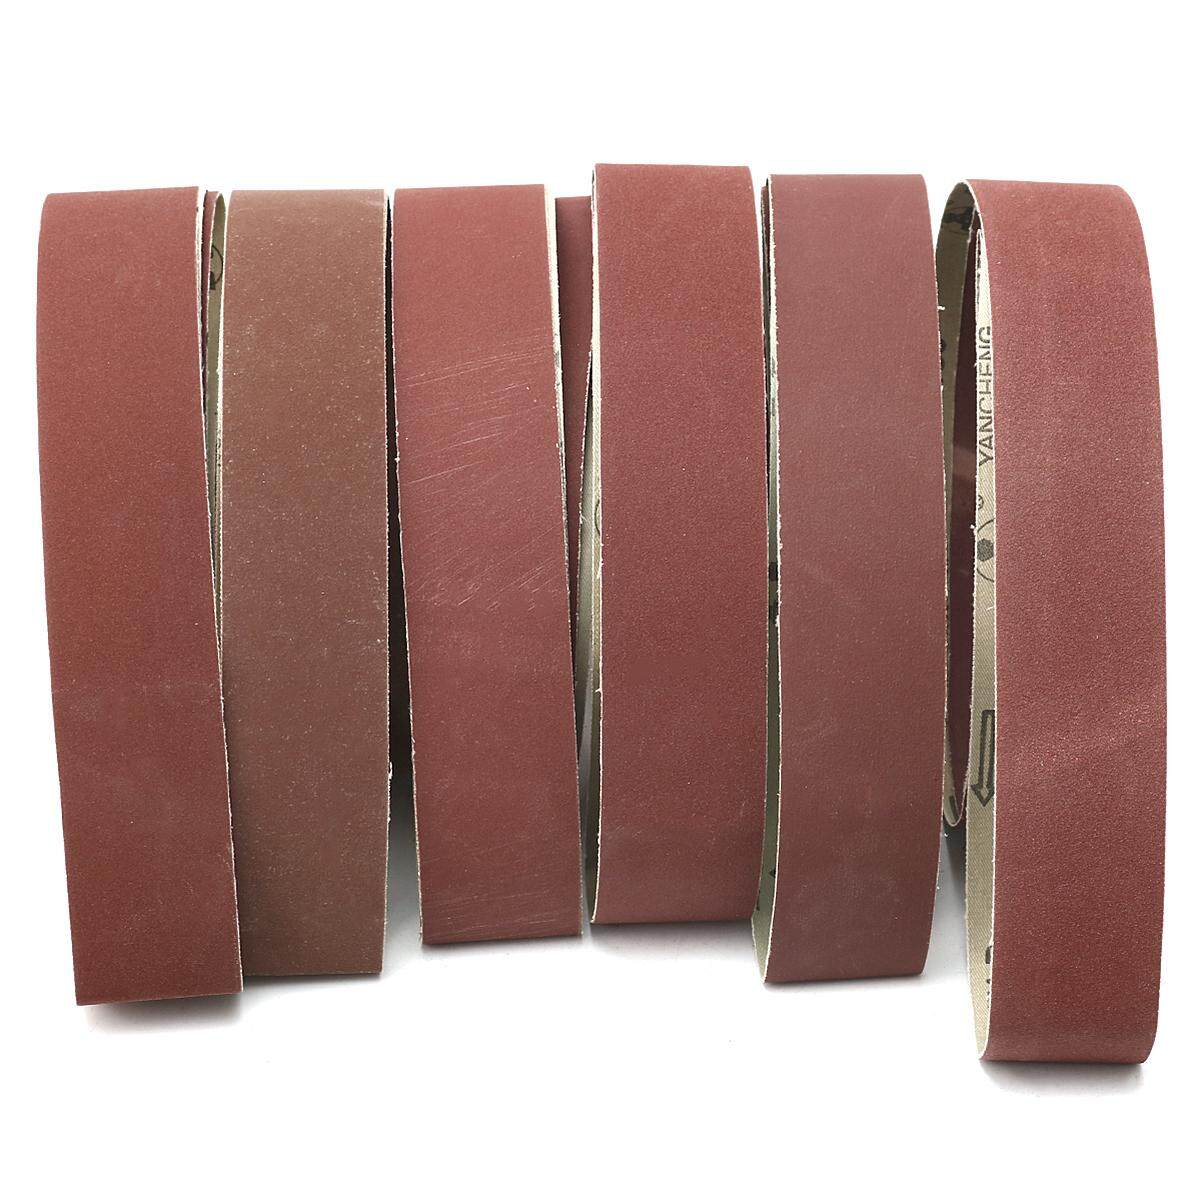 180,240,320,400,600,800 Grits 2 X 72 Inch Aluminum Oxide Sanding Belts 6PCS